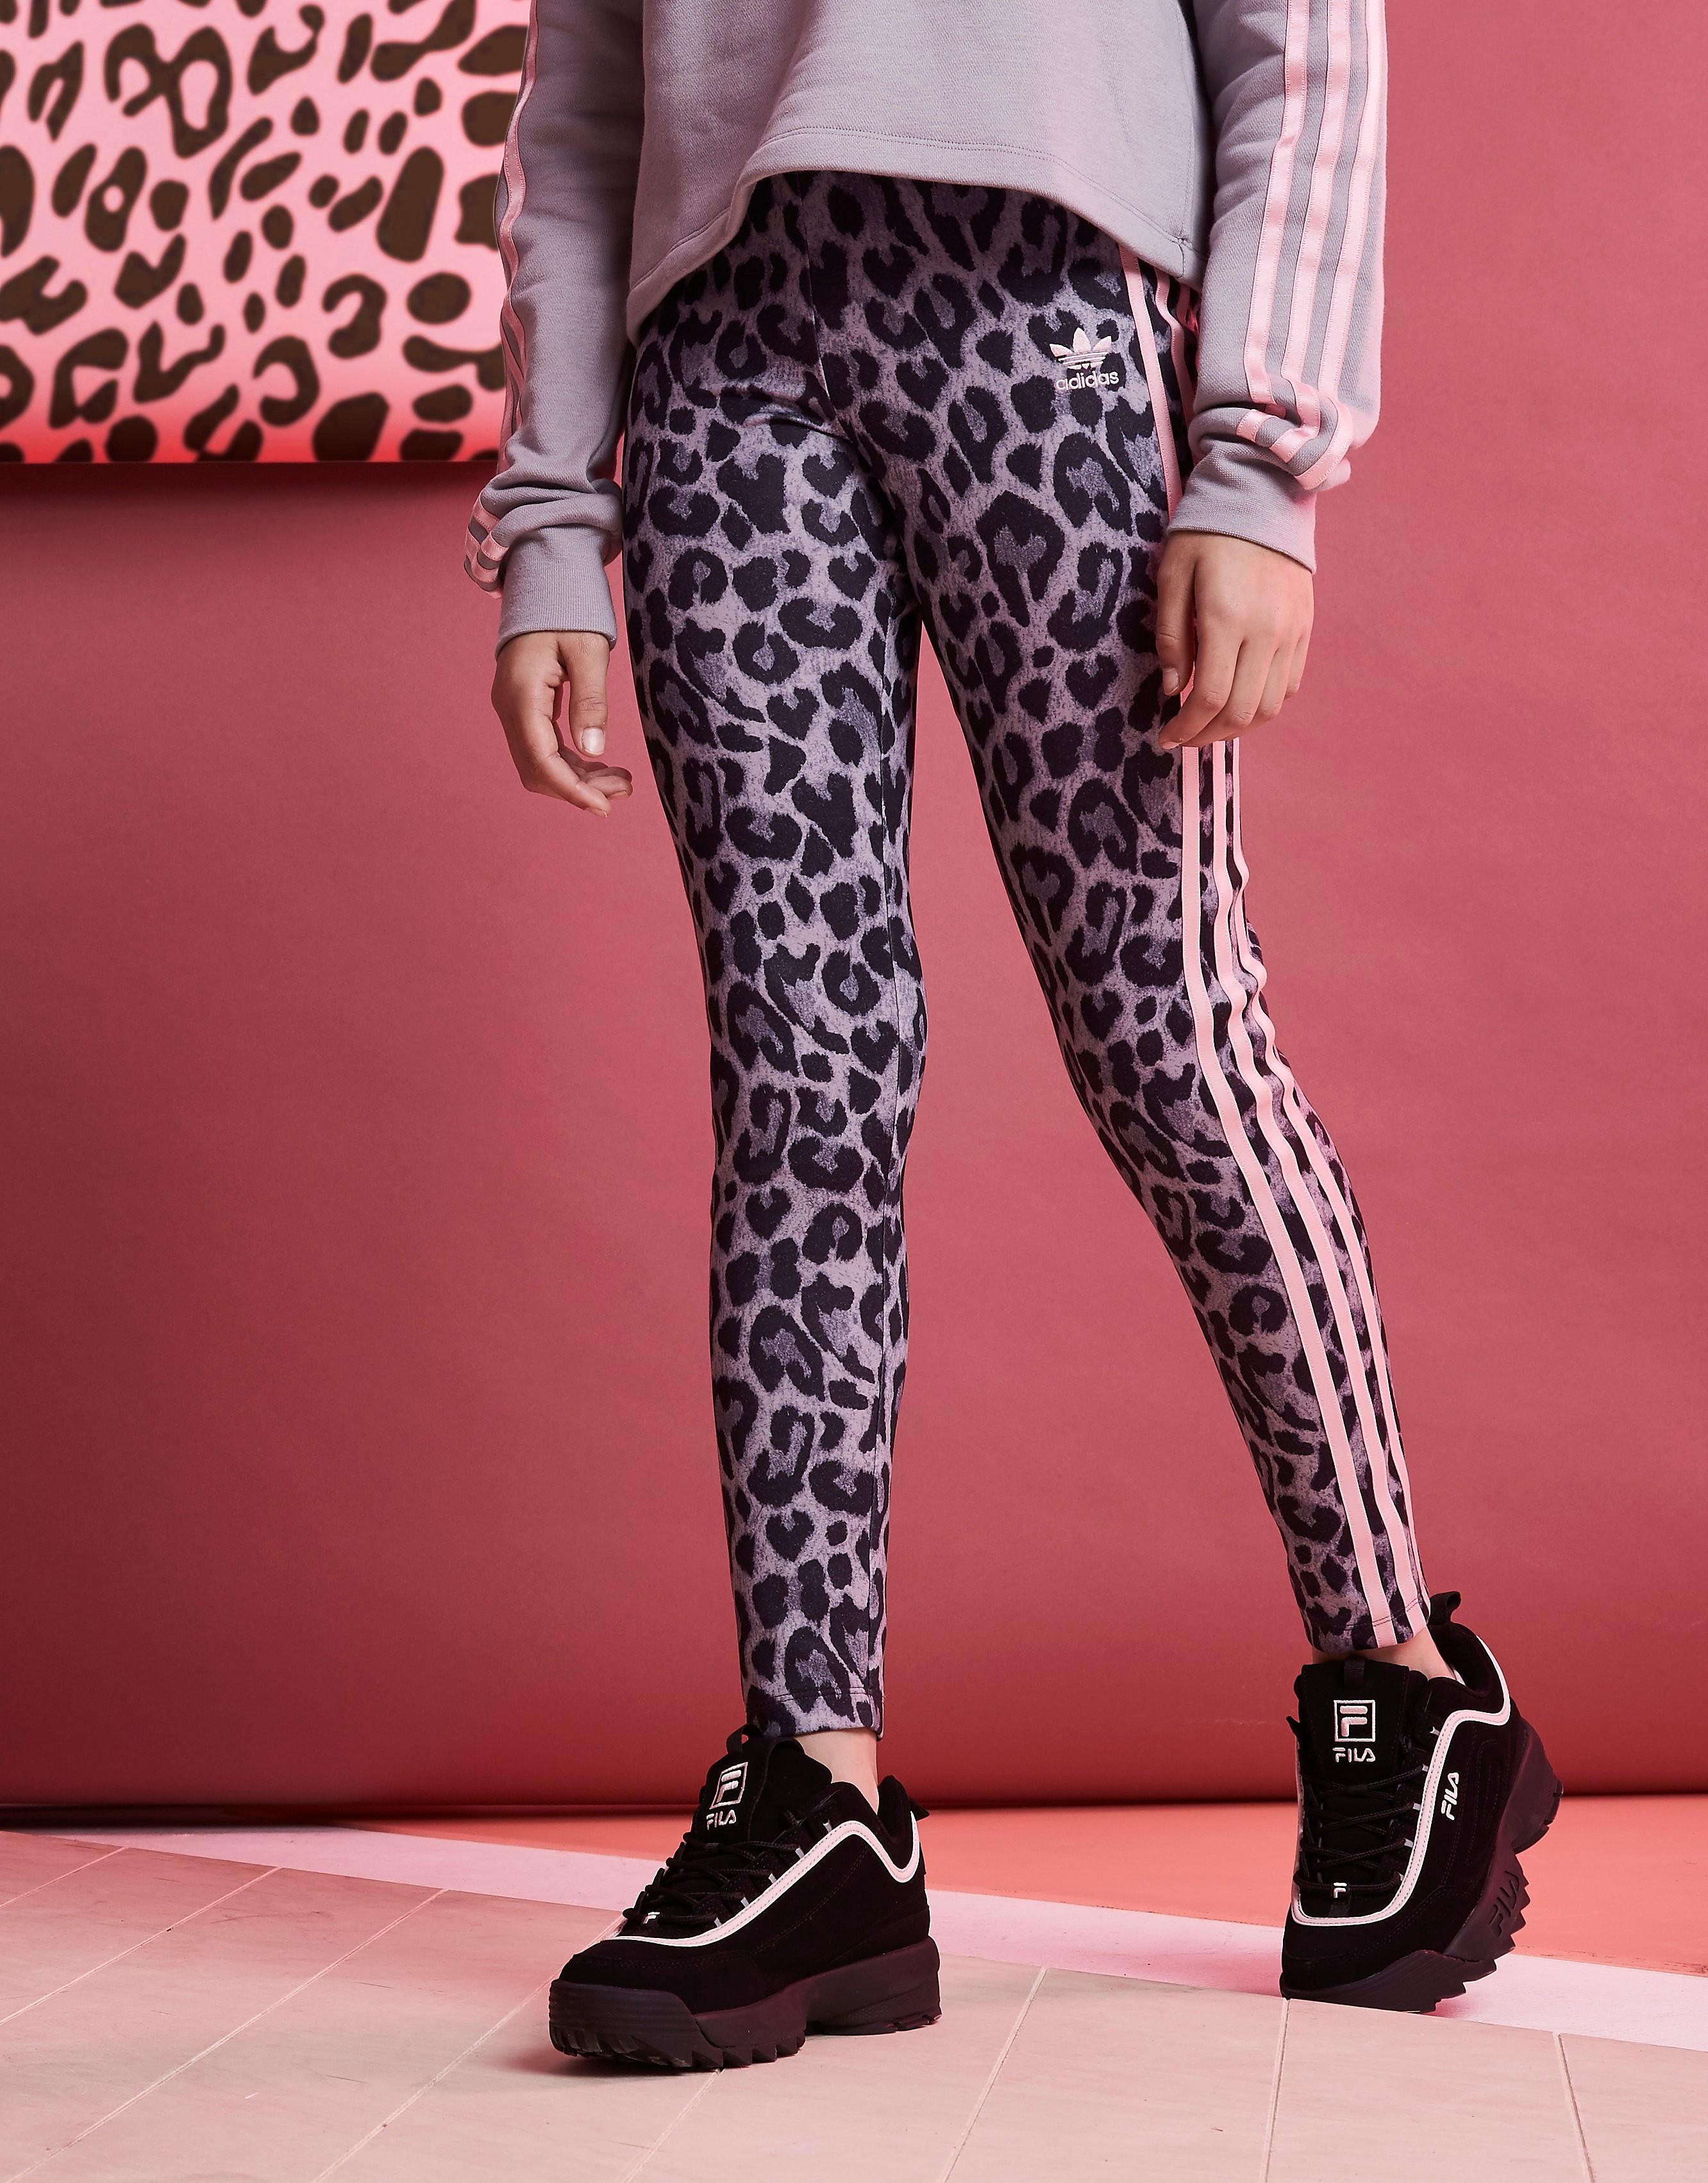 adidas Originals Girls' Leopard All Over Print Leggings Junior - Only at JD - Grau - Kids, Grau